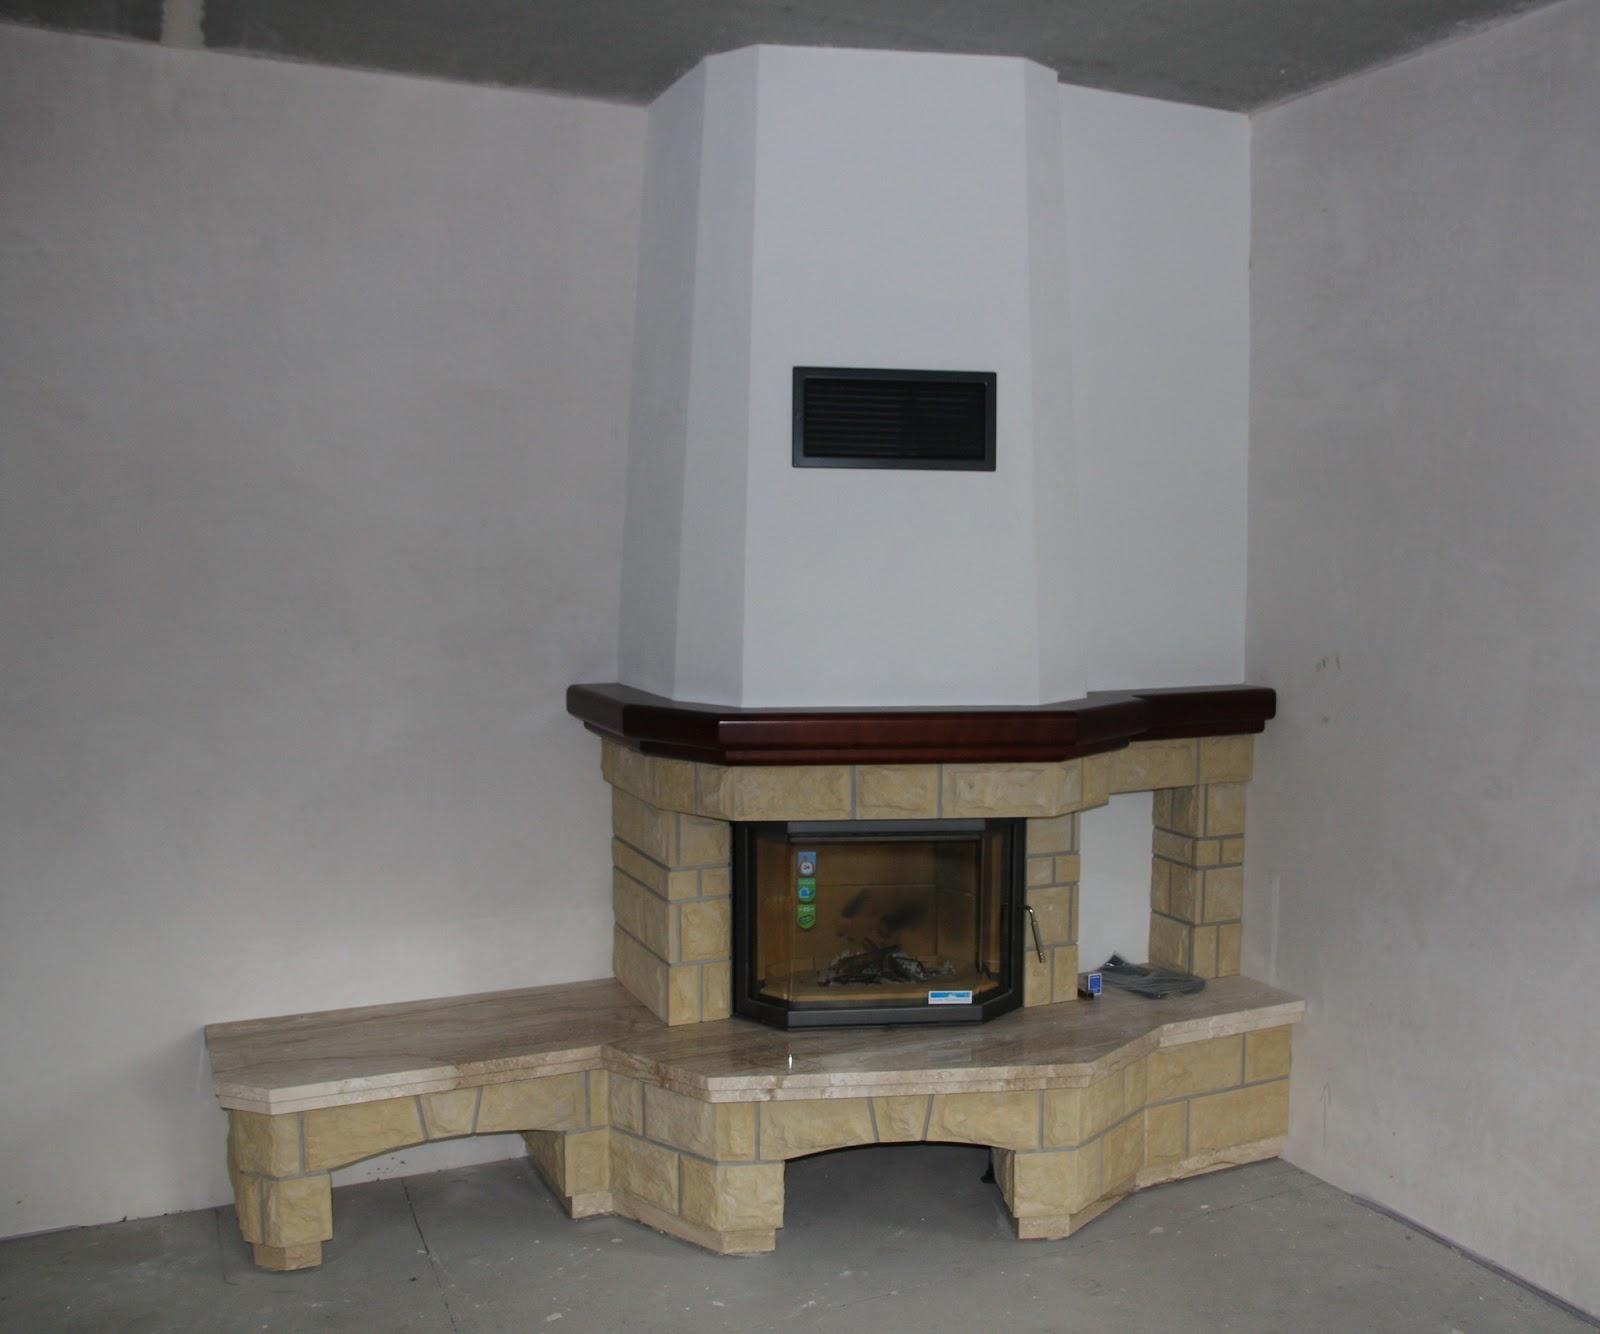 unser hausbau mit fibav kamin und treppe. Black Bedroom Furniture Sets. Home Design Ideas